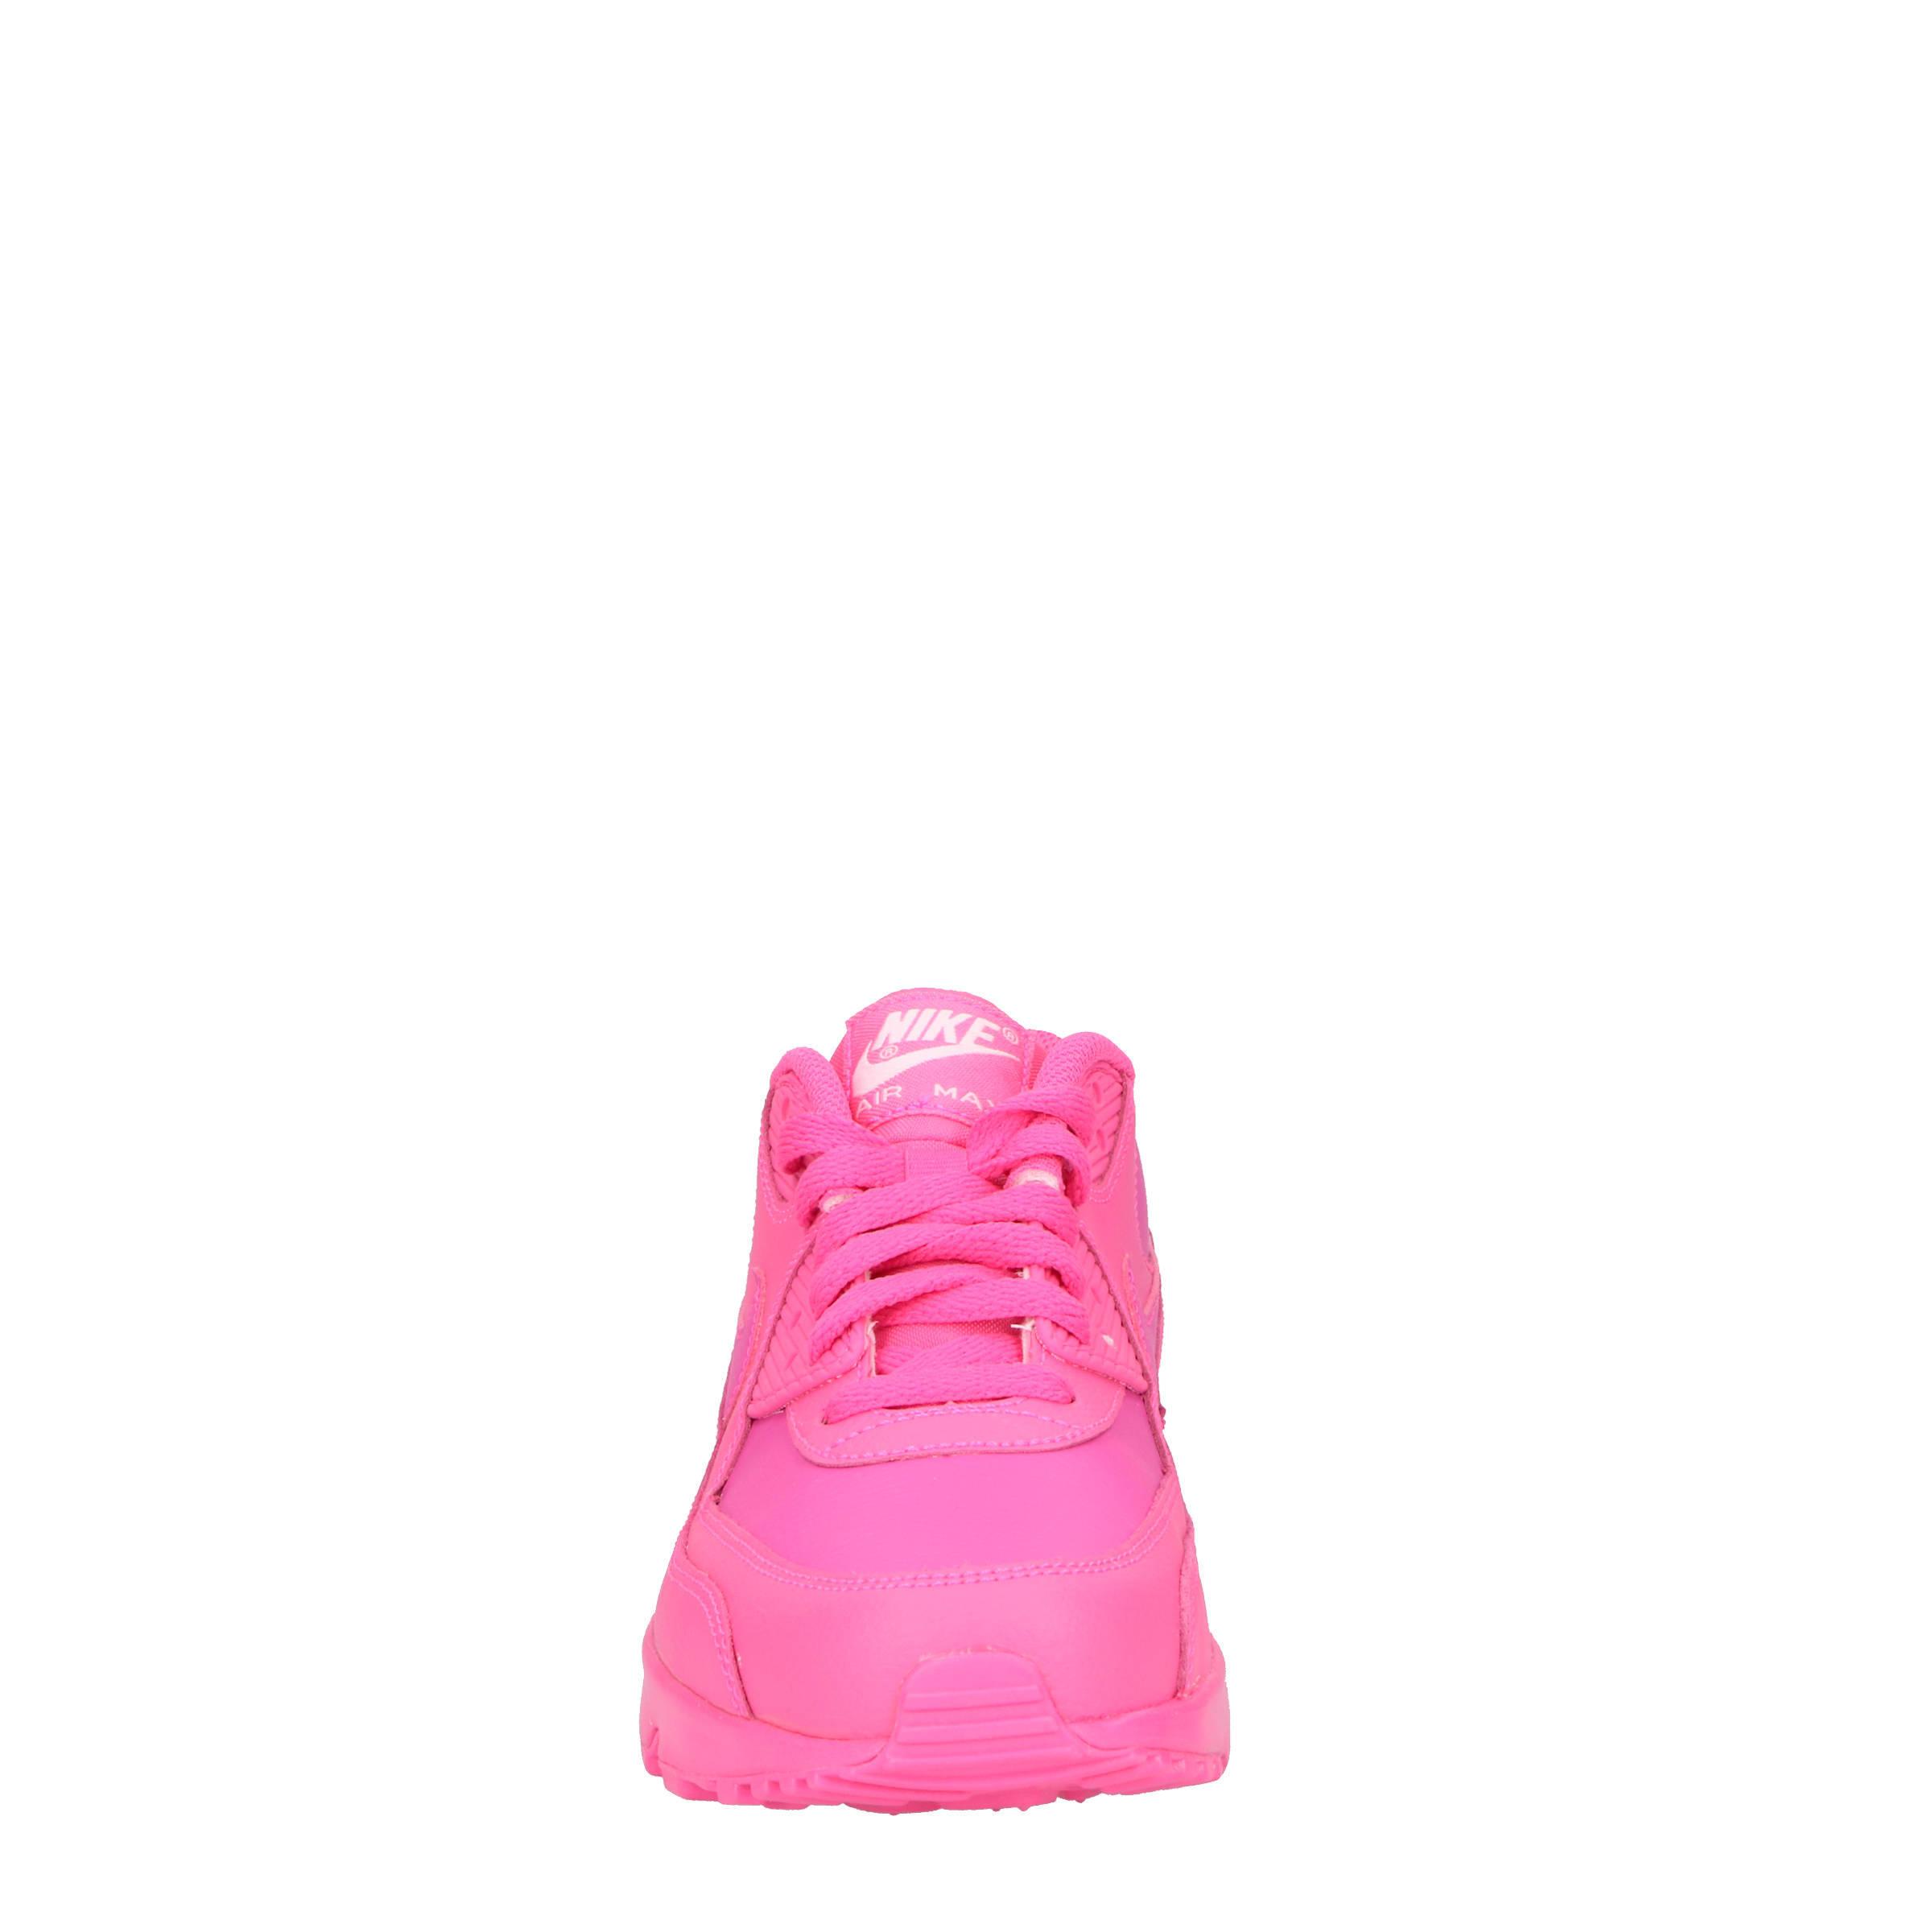 Nike Air Max 90 Ltr sneakers fuchsia | wehkamp